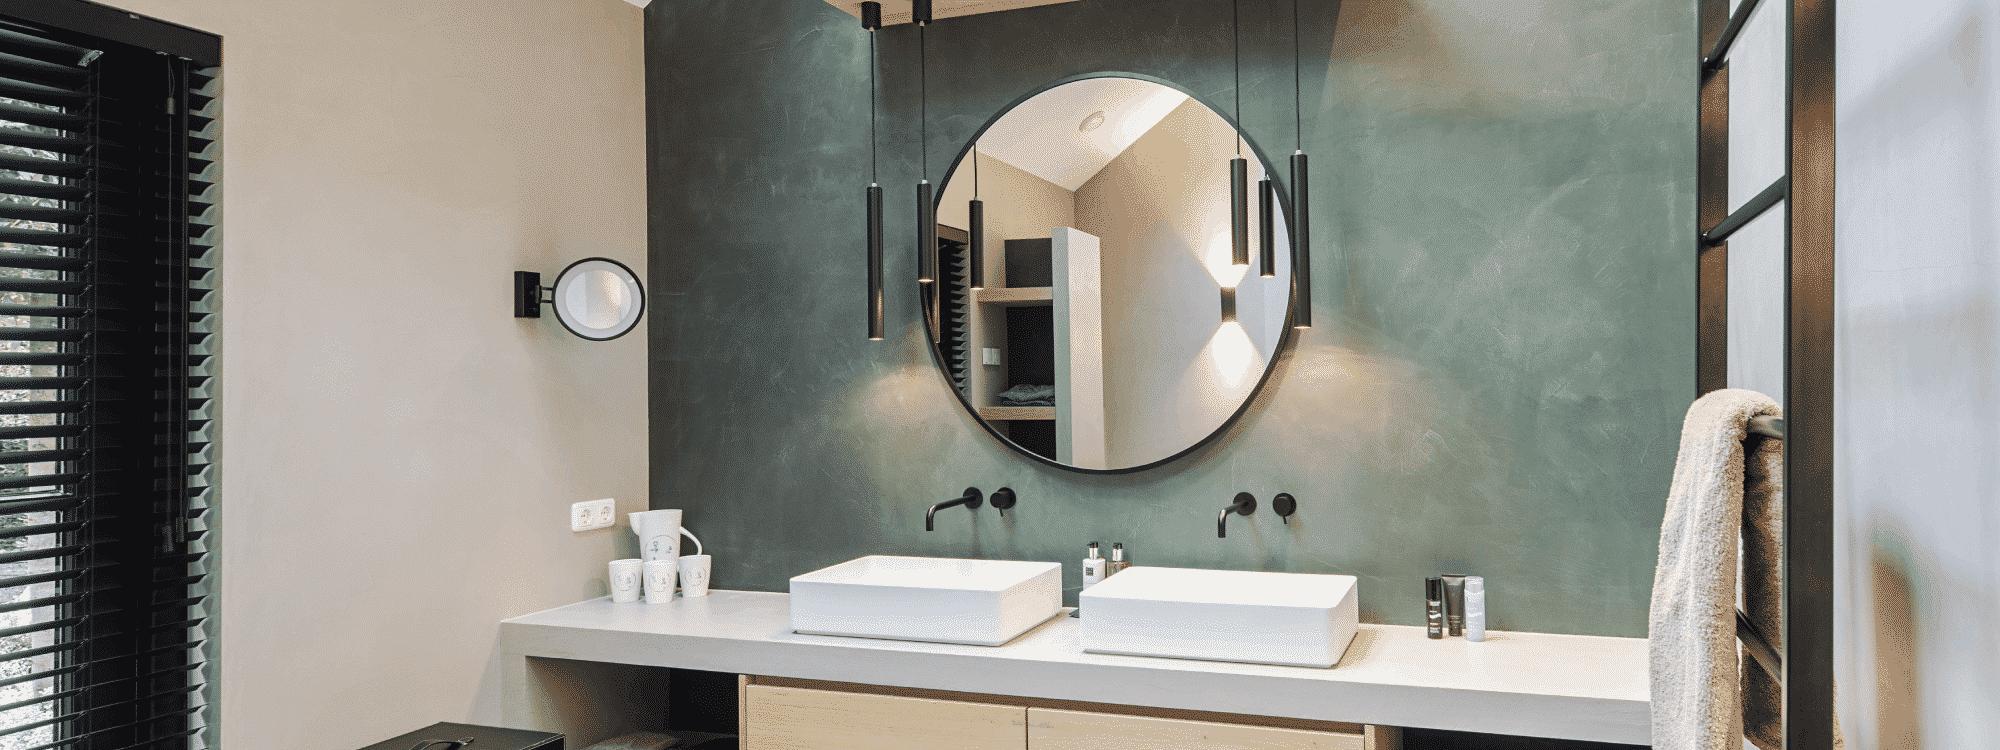 header eerbeek badkamer